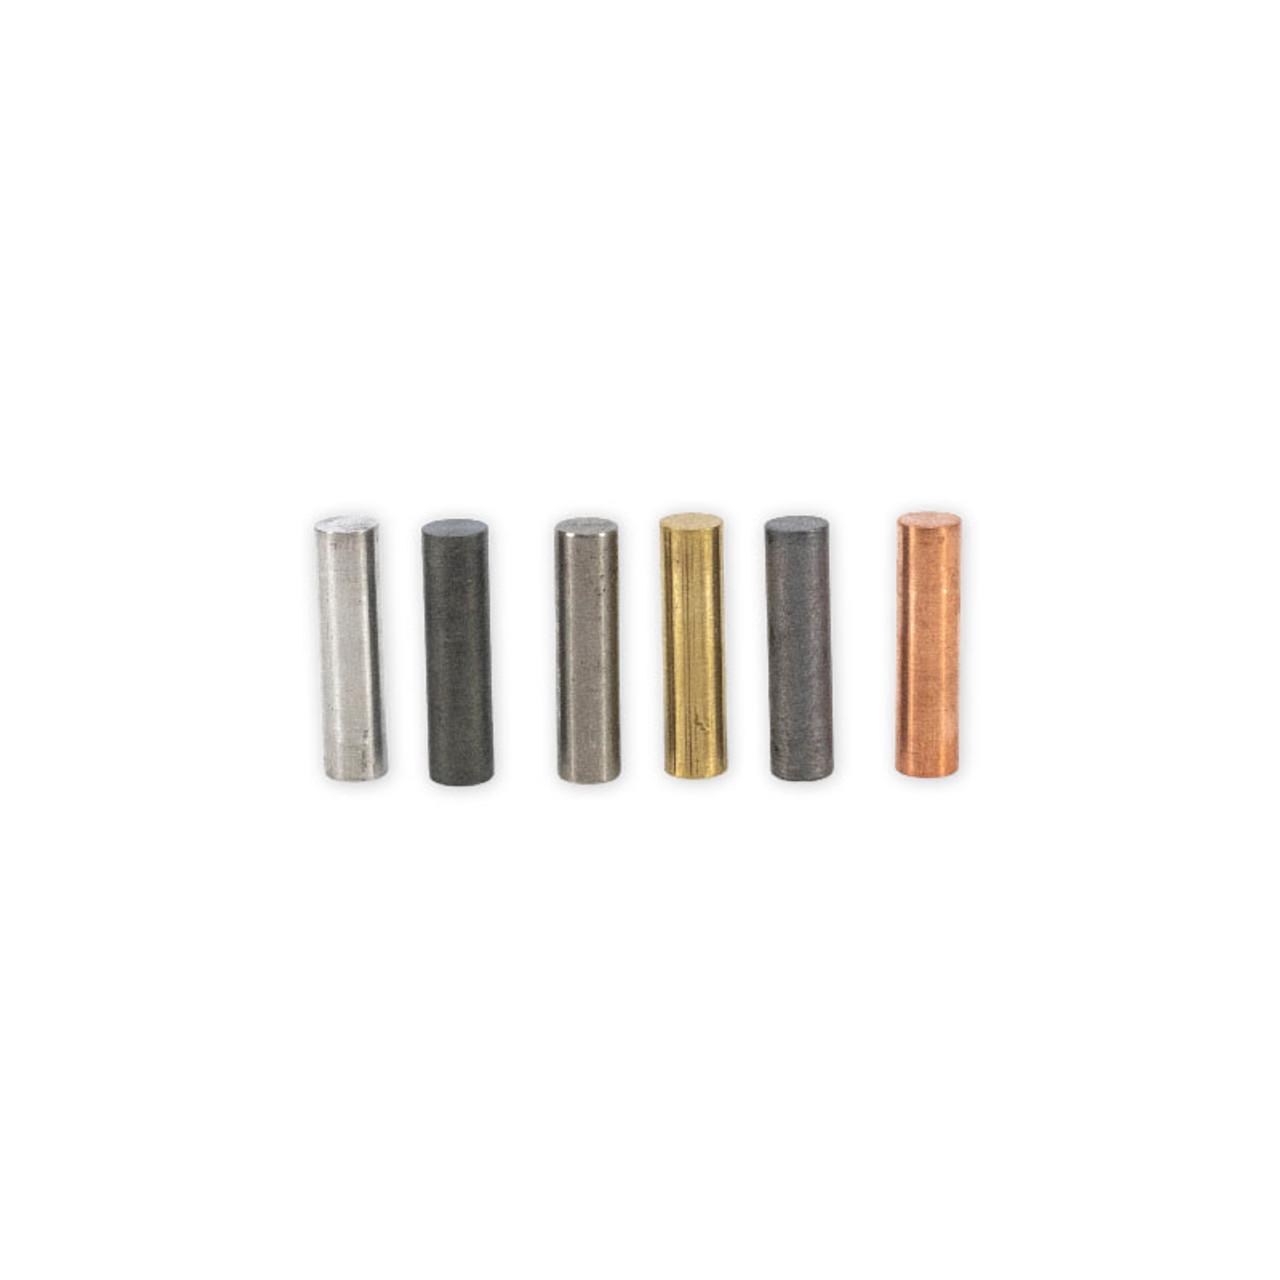 Metal Cylinder Set (6 Pieces) 10 x 40 mm